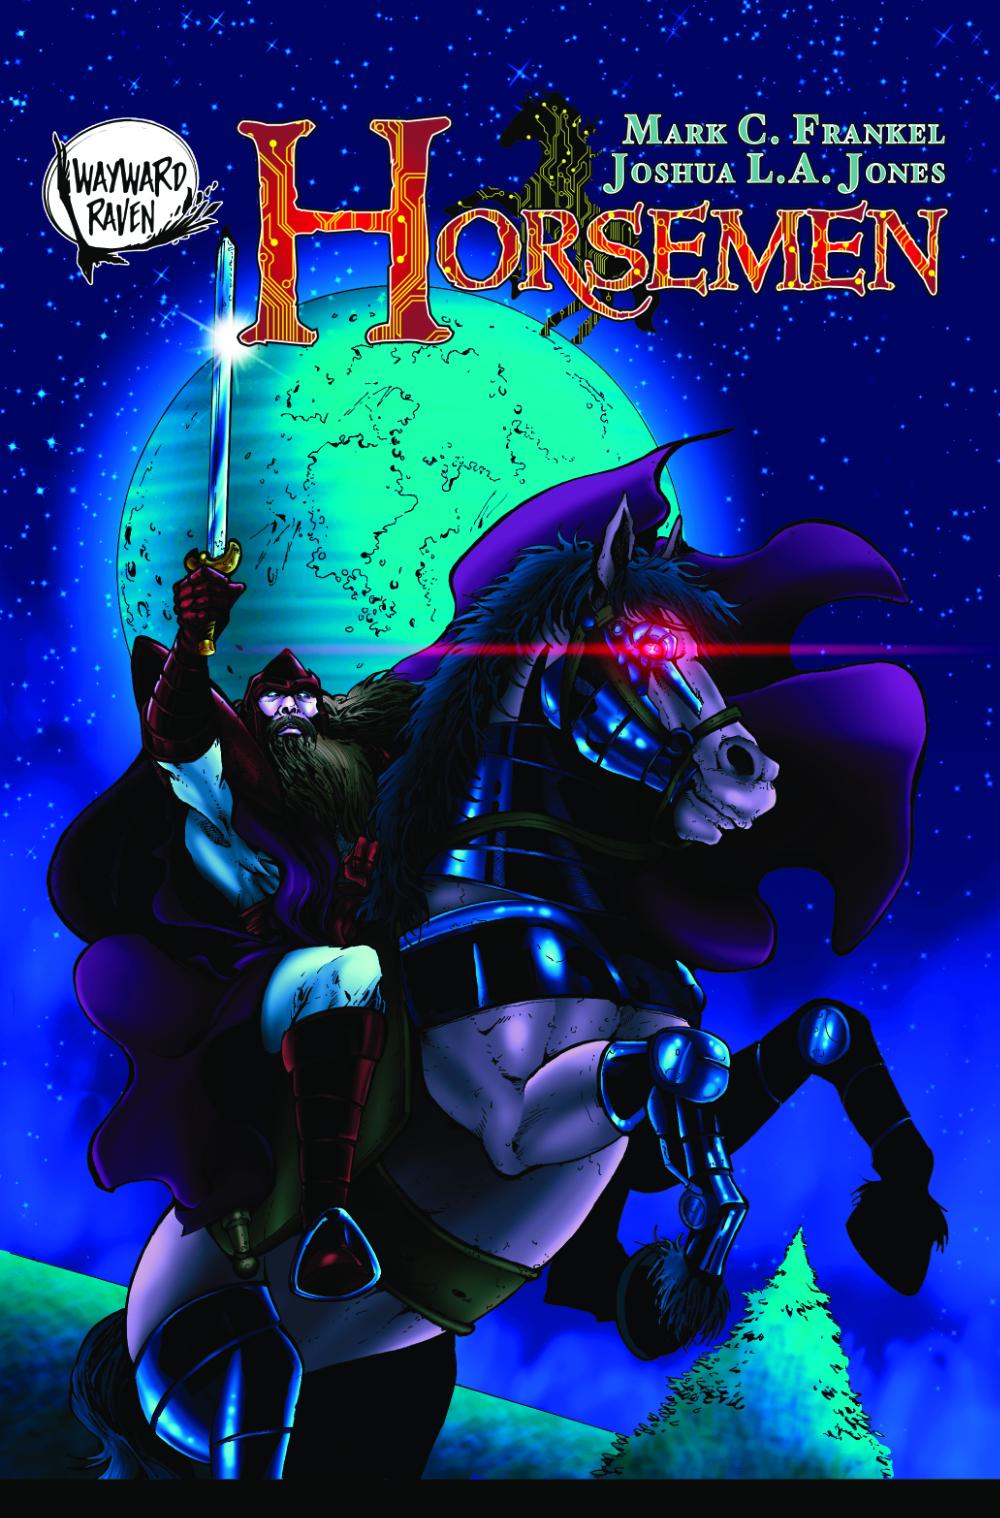 Horsemen - Trade Cover 1x.jpg